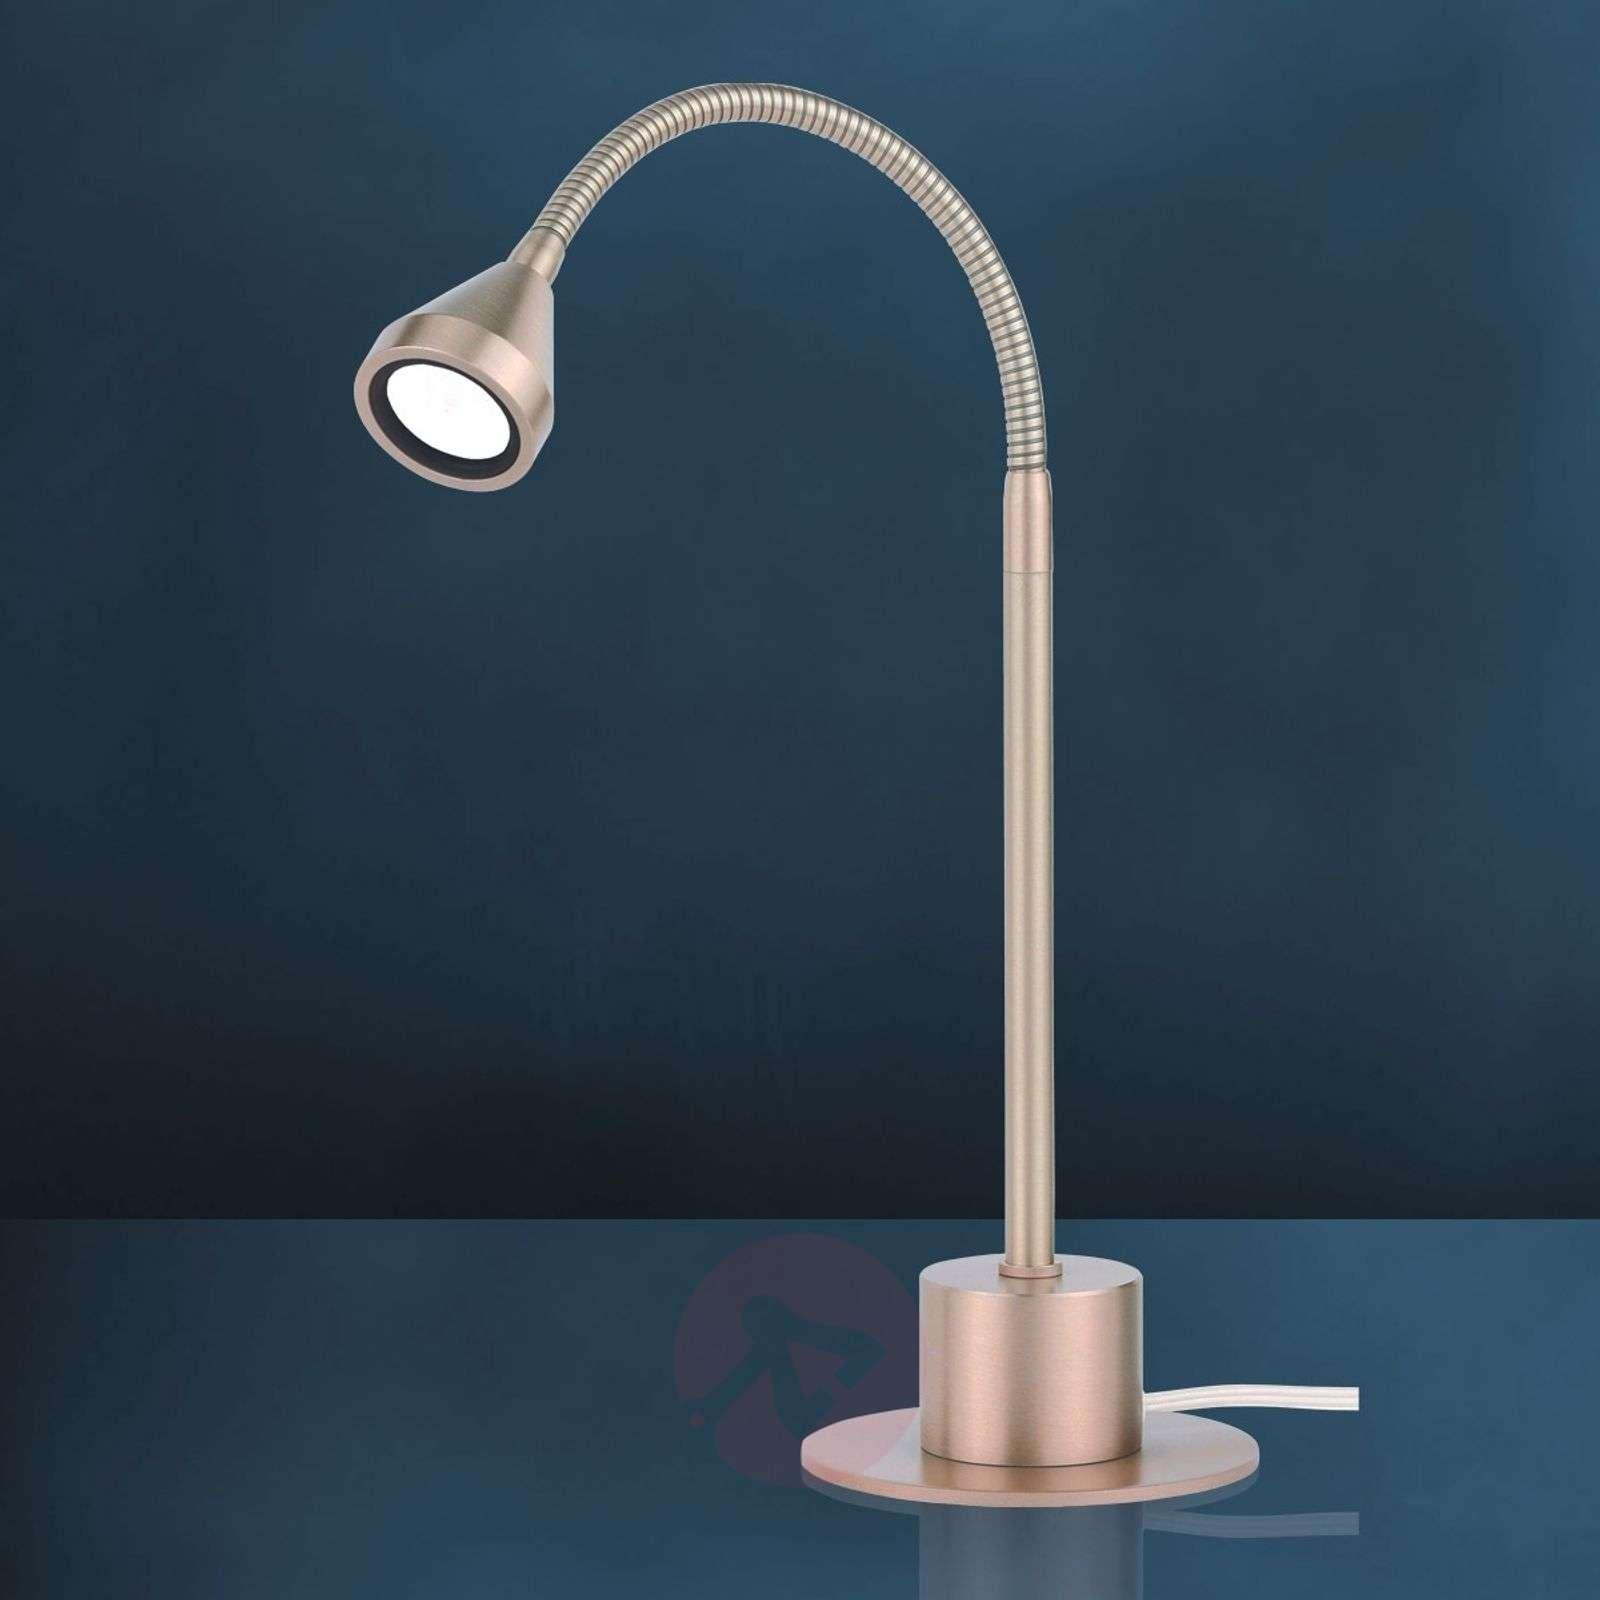 Led Table Lamp Mini Flexible Arm Cool White Lights Ie